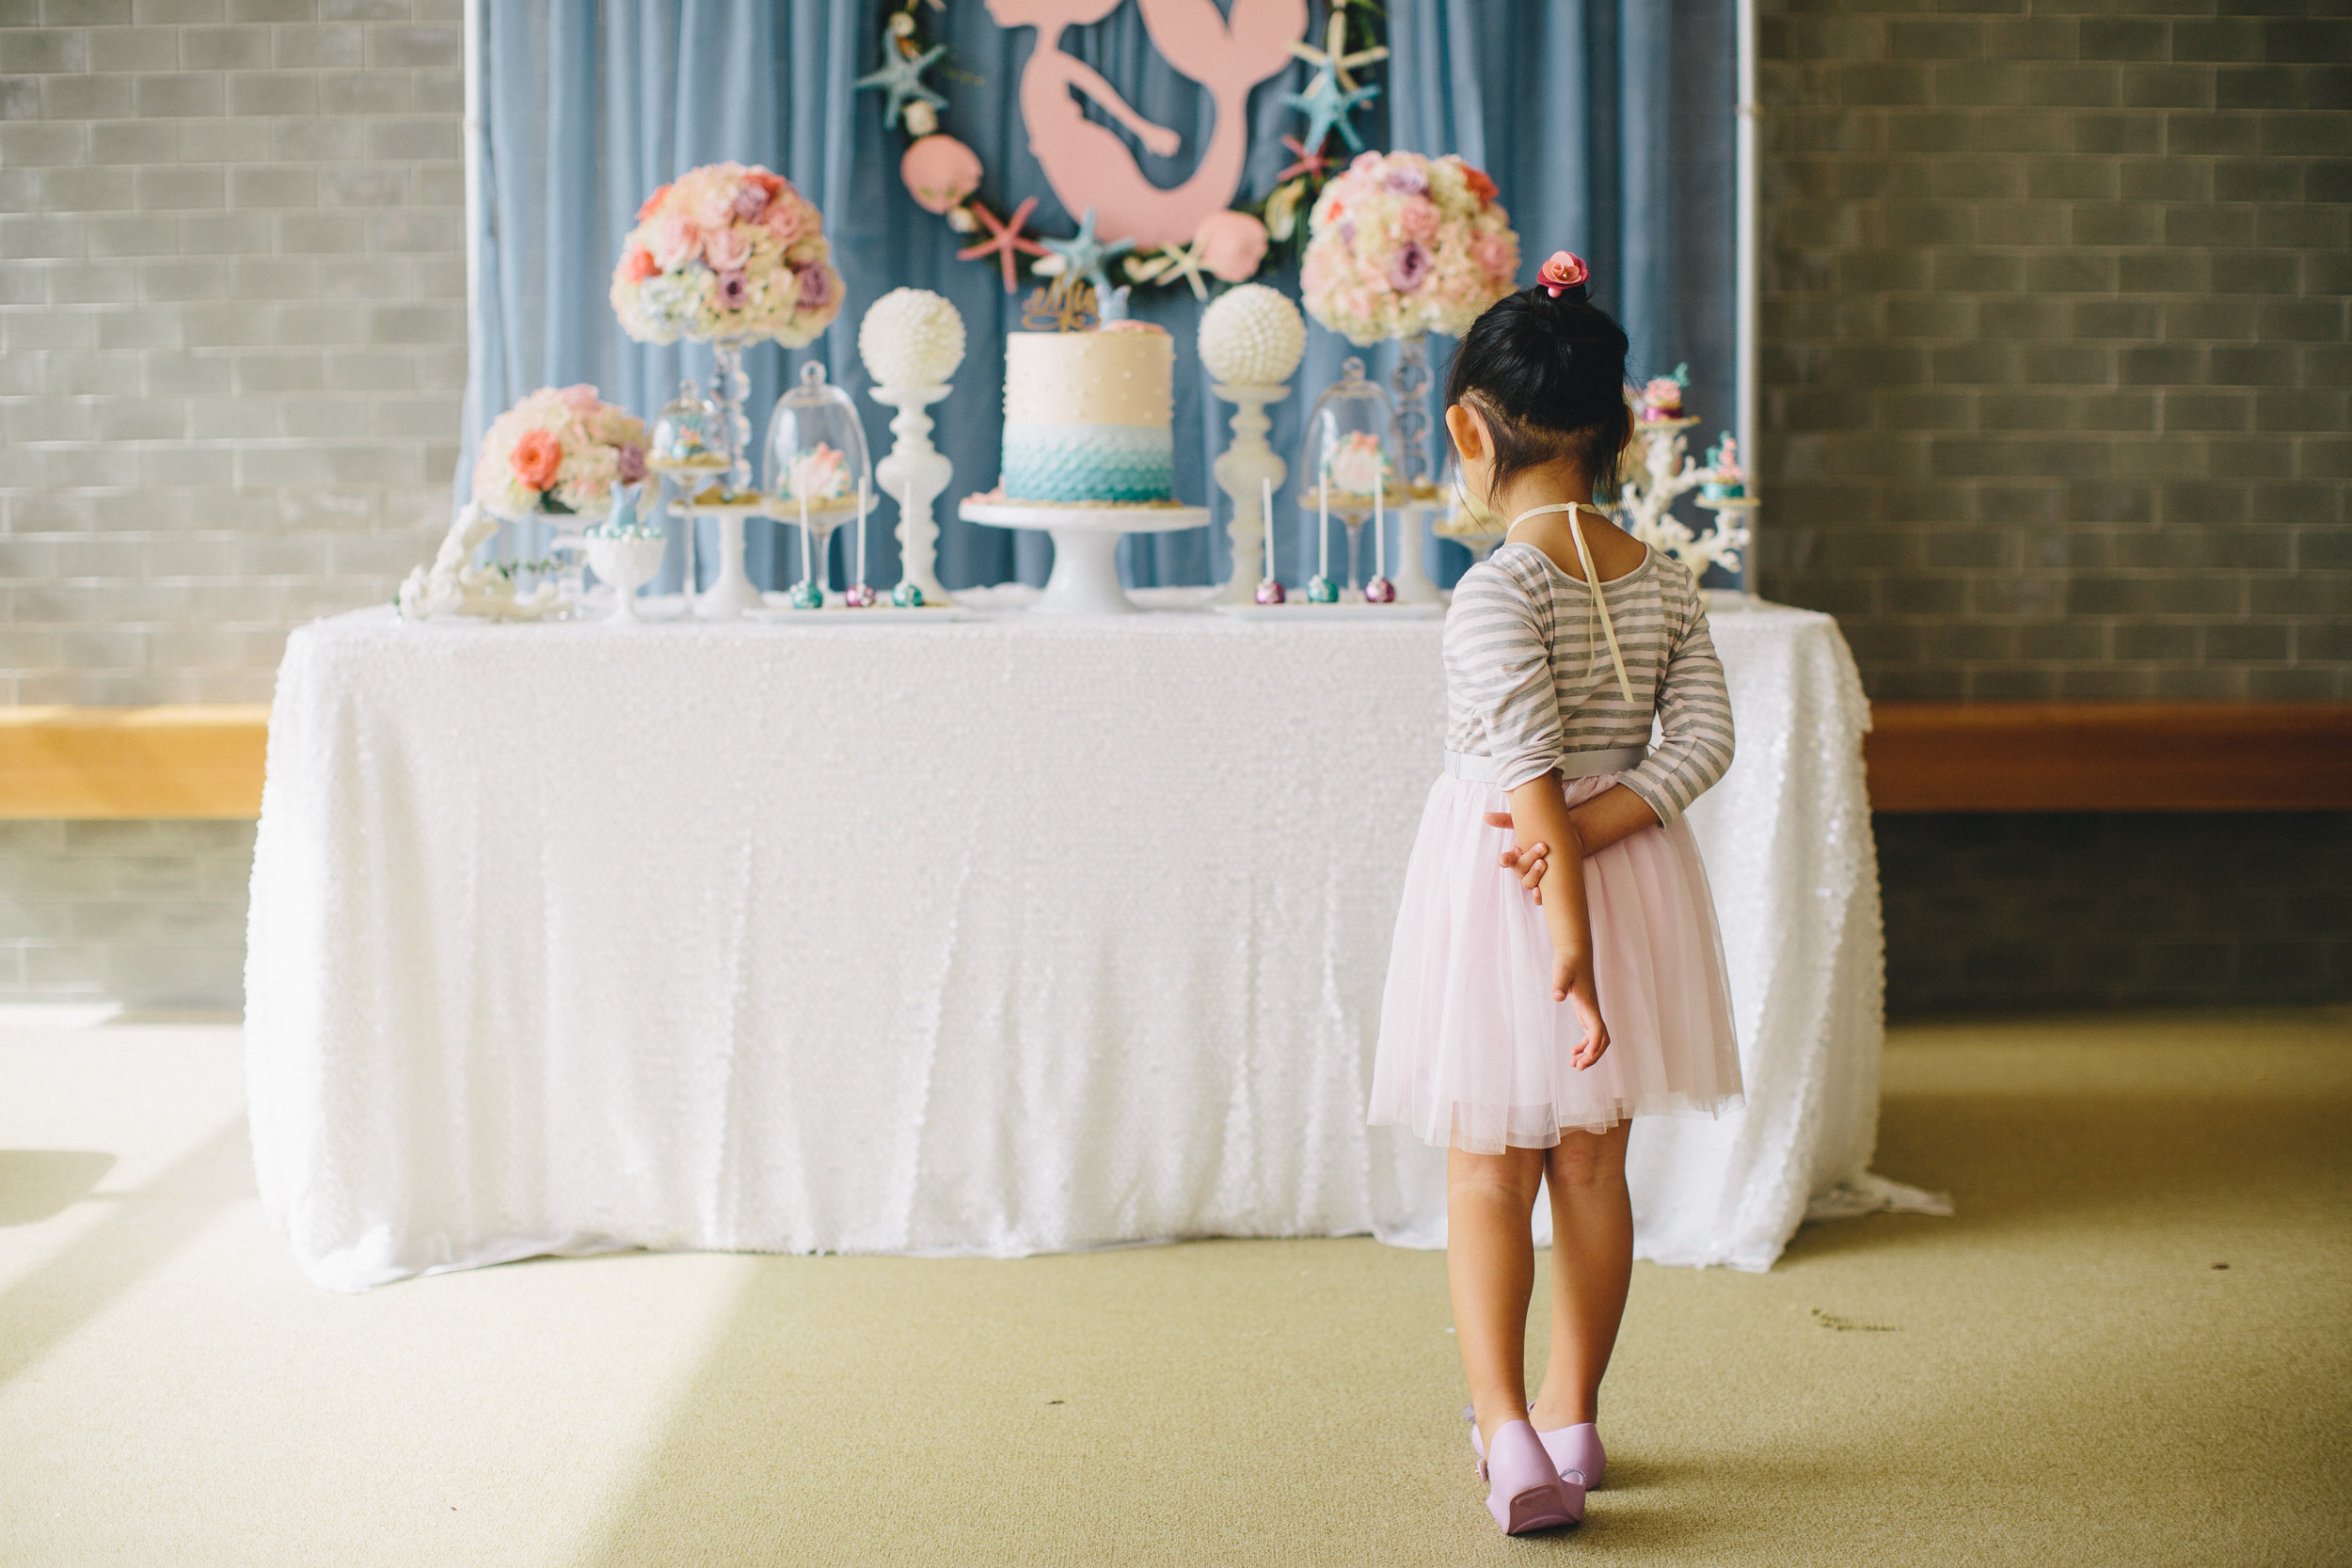 Mia s First Birthday-Mia s First Birthday-0001.jpg